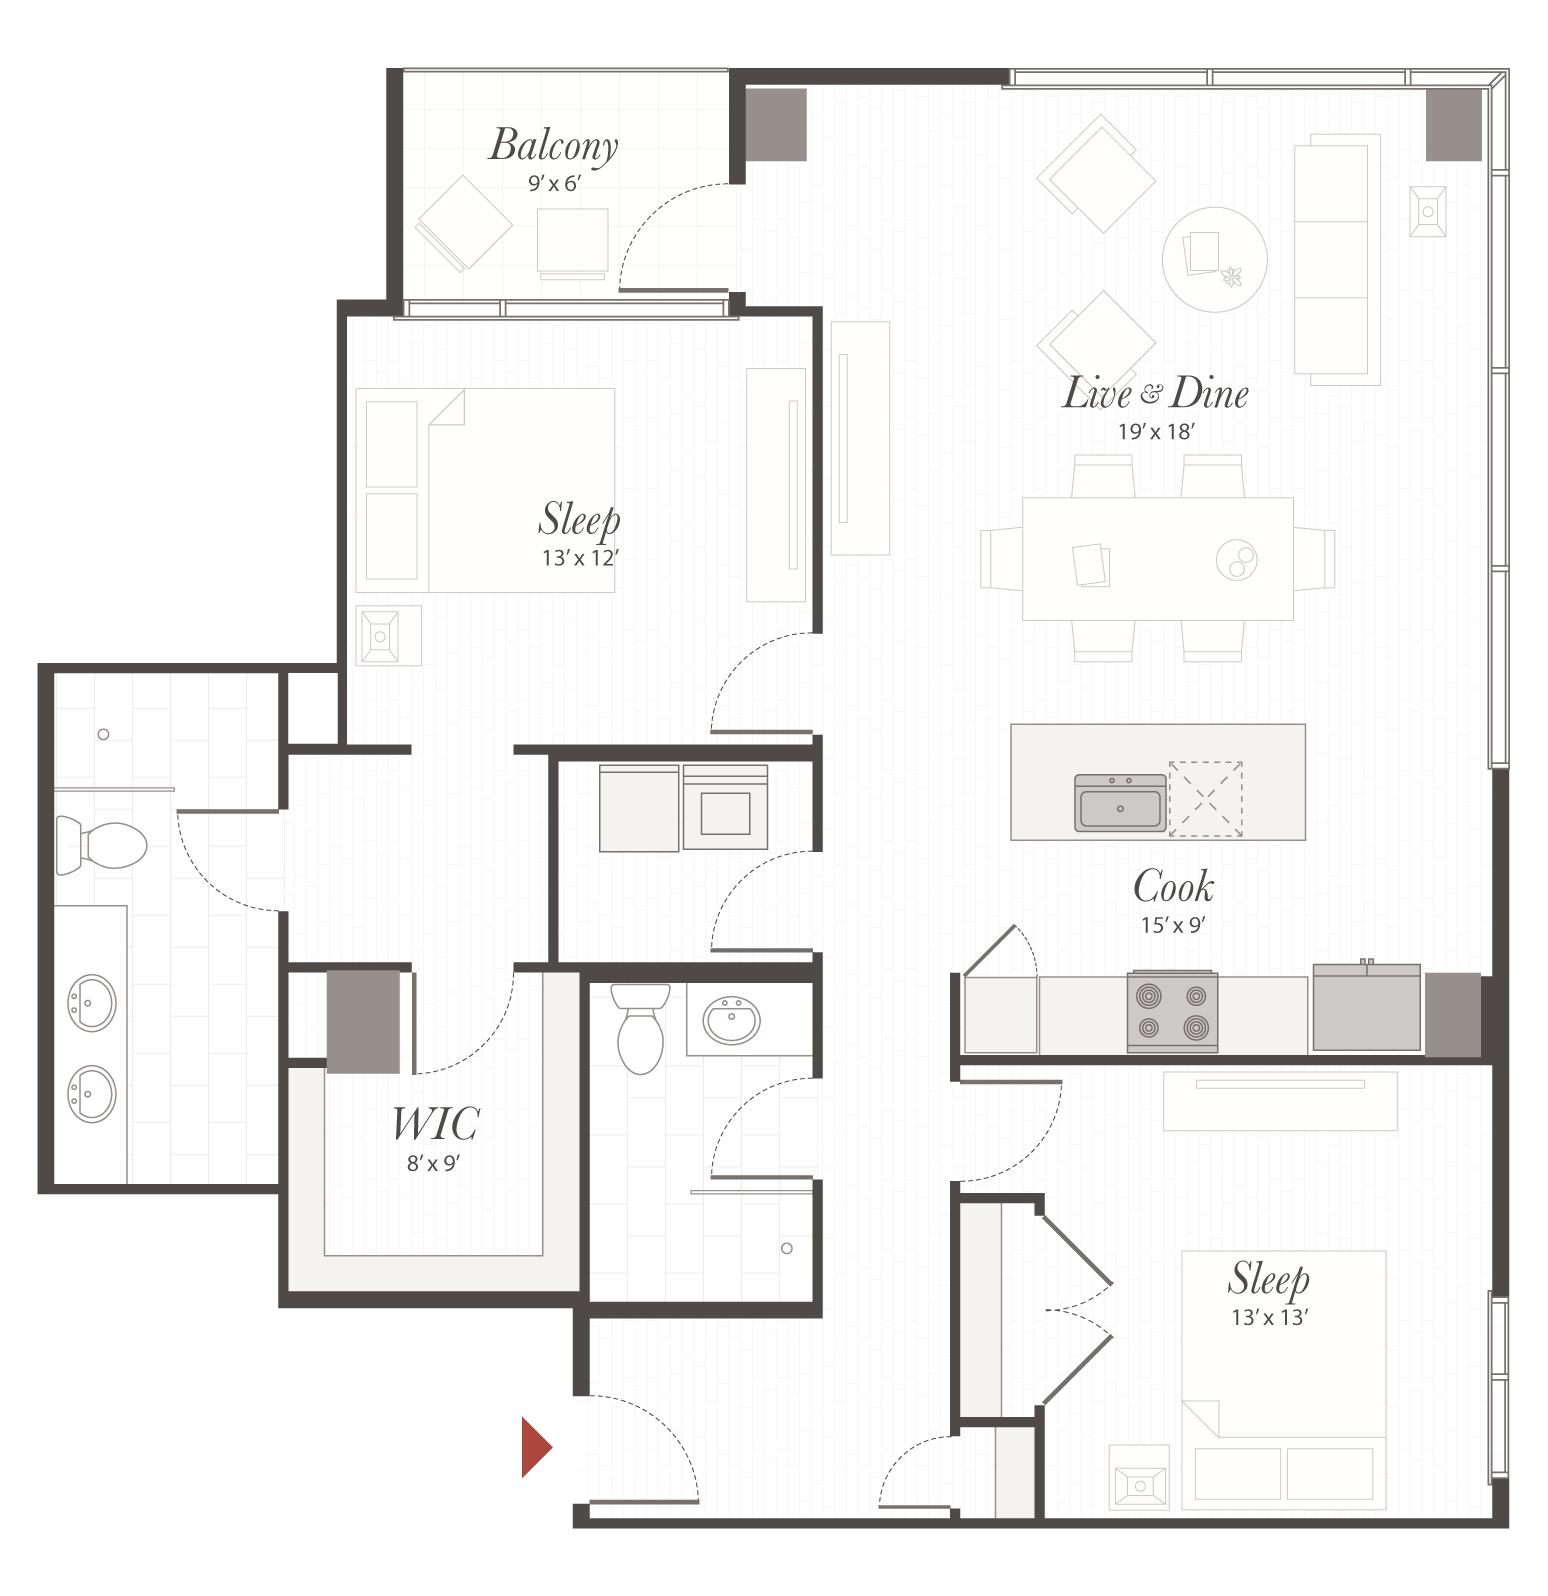 B6 1 bedroom apartment cincinnati encore apartments - 2 bedroom apartments in cincinnati ...